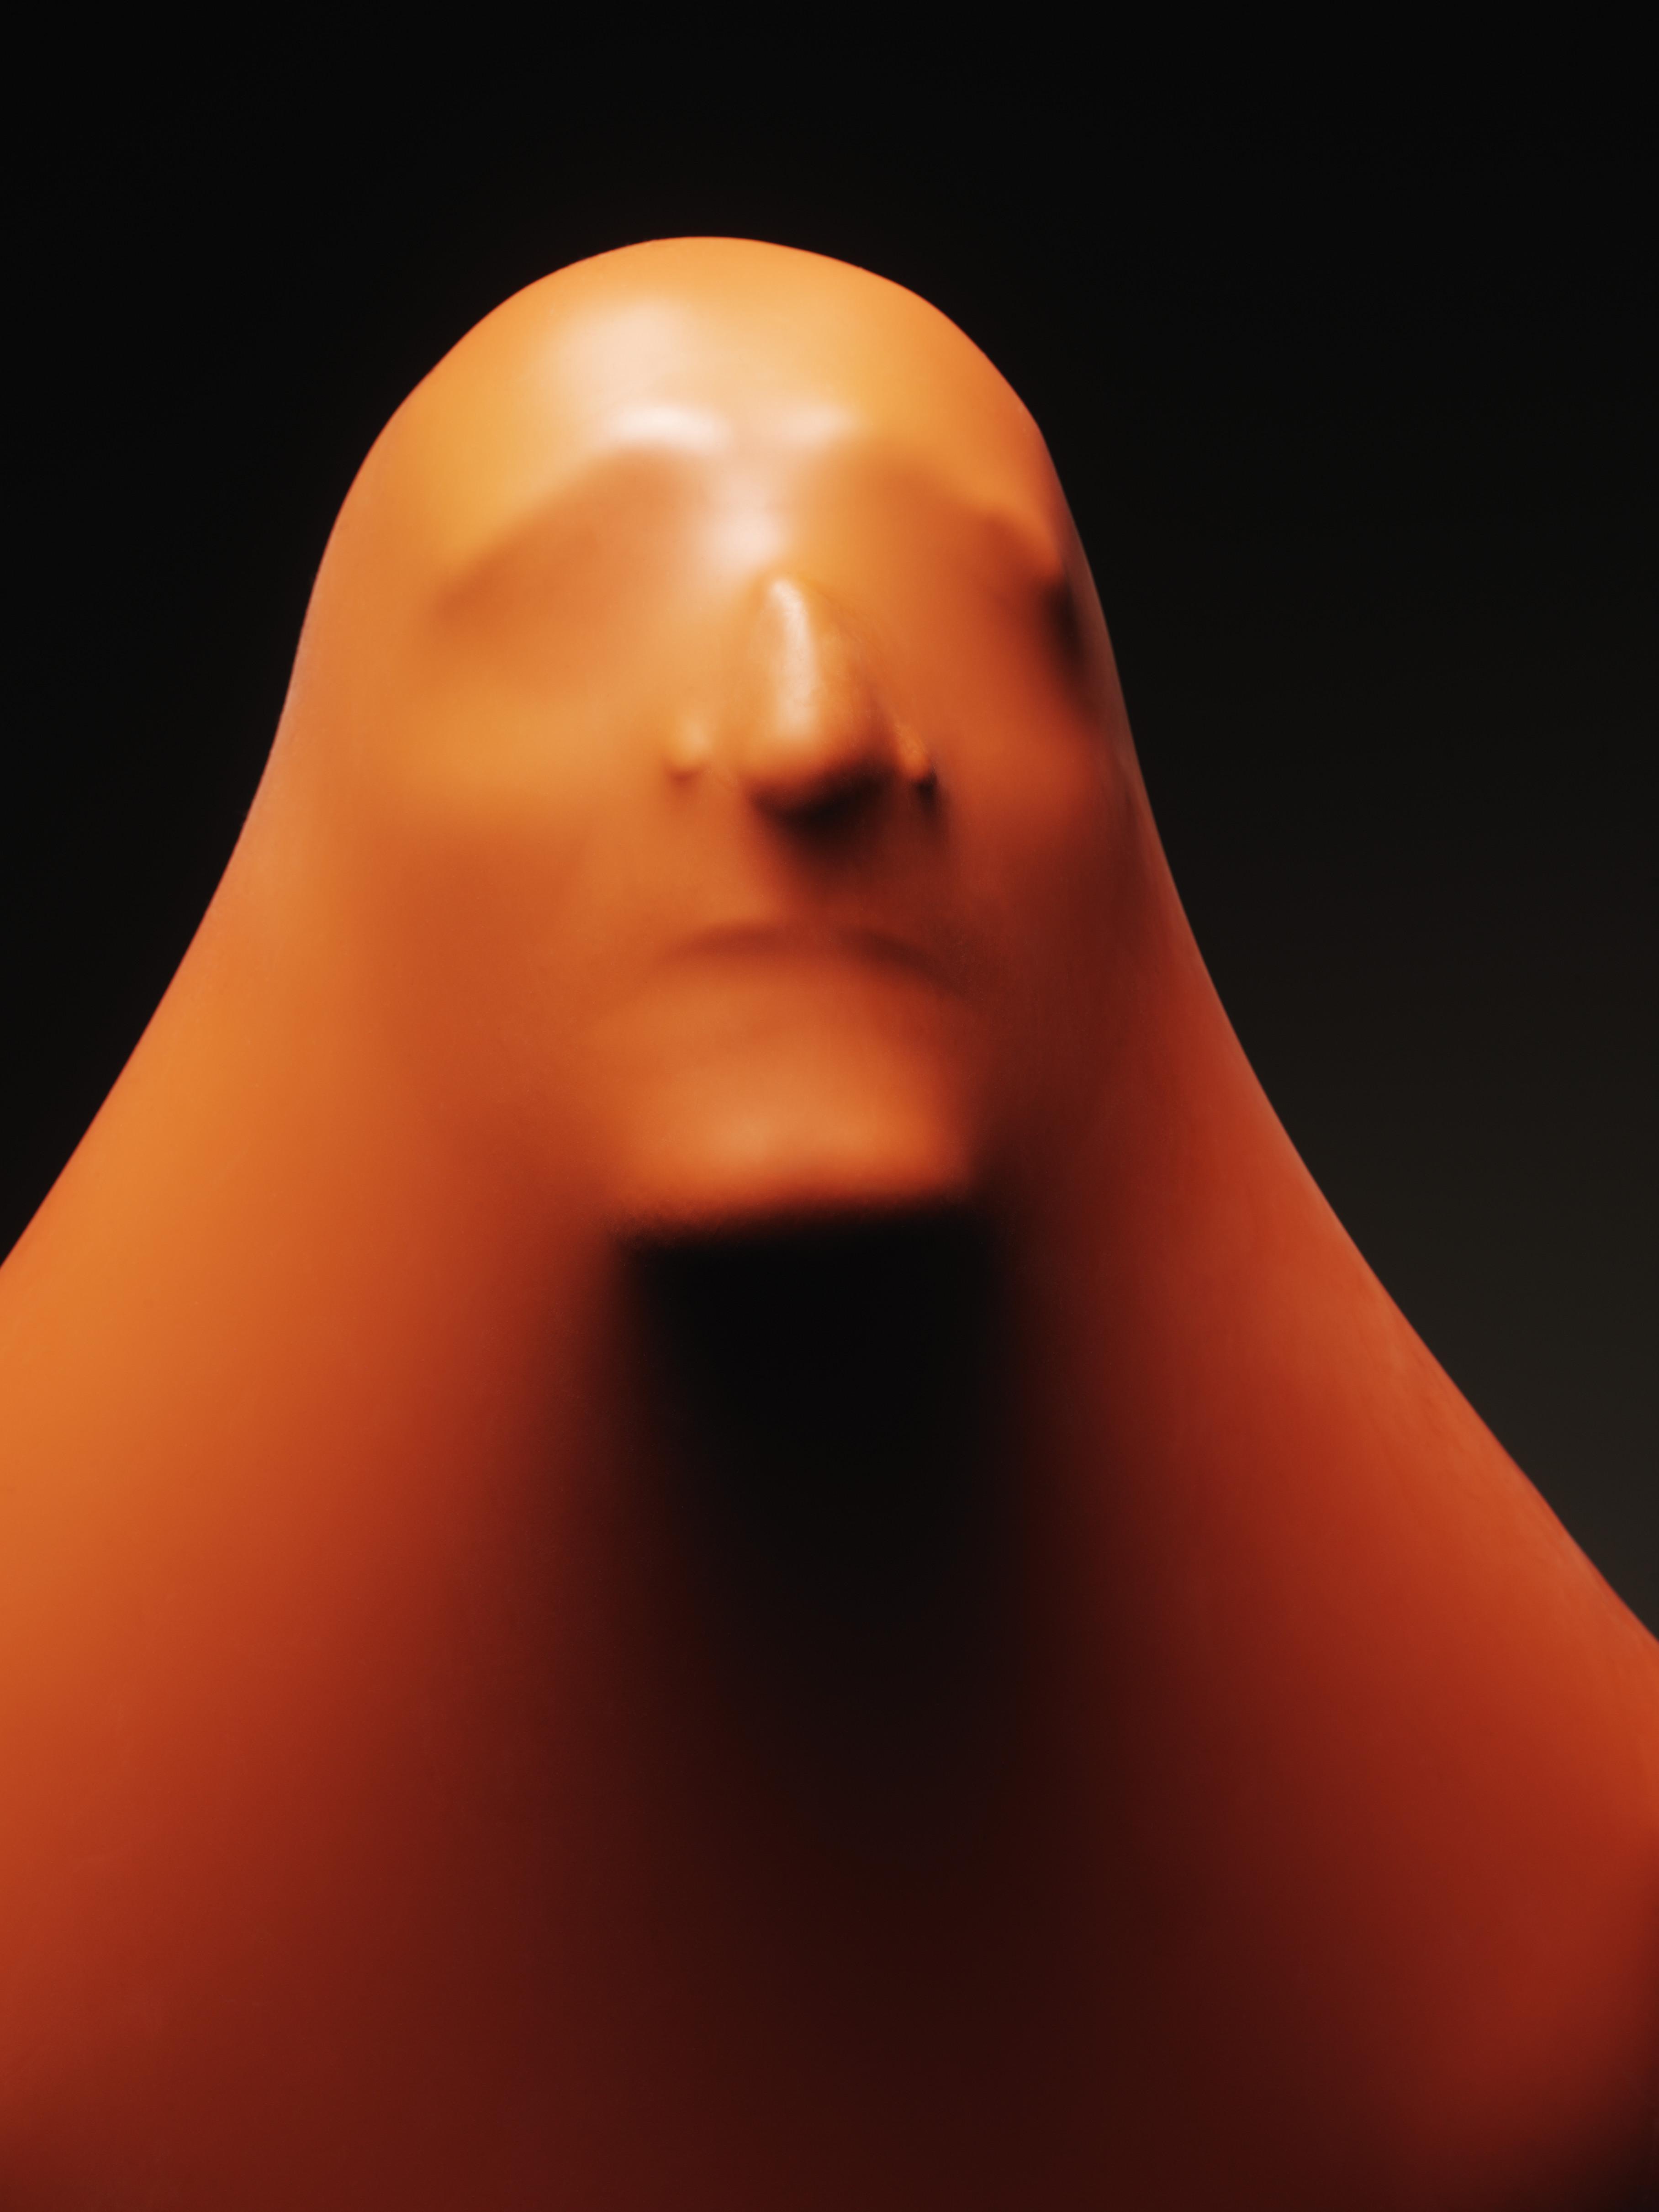 Impression of man's face through orange rubber, close-up